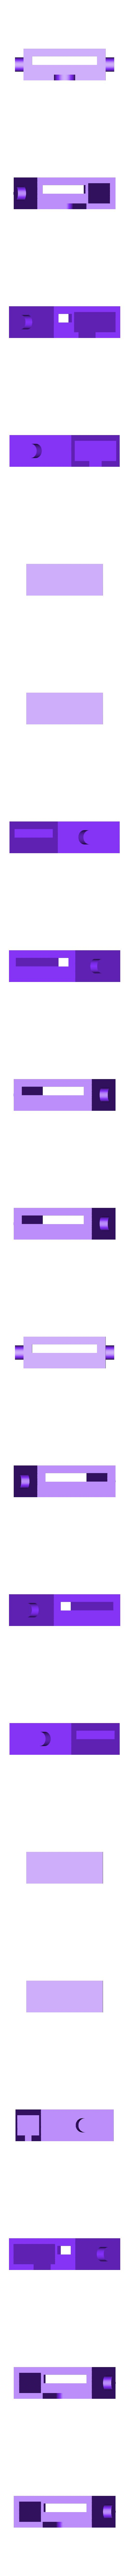 camera-housing-from-mox.stl Download free STL file Raspberry Pi Print Bed Mount. • 3D printer object, DonaldSayers